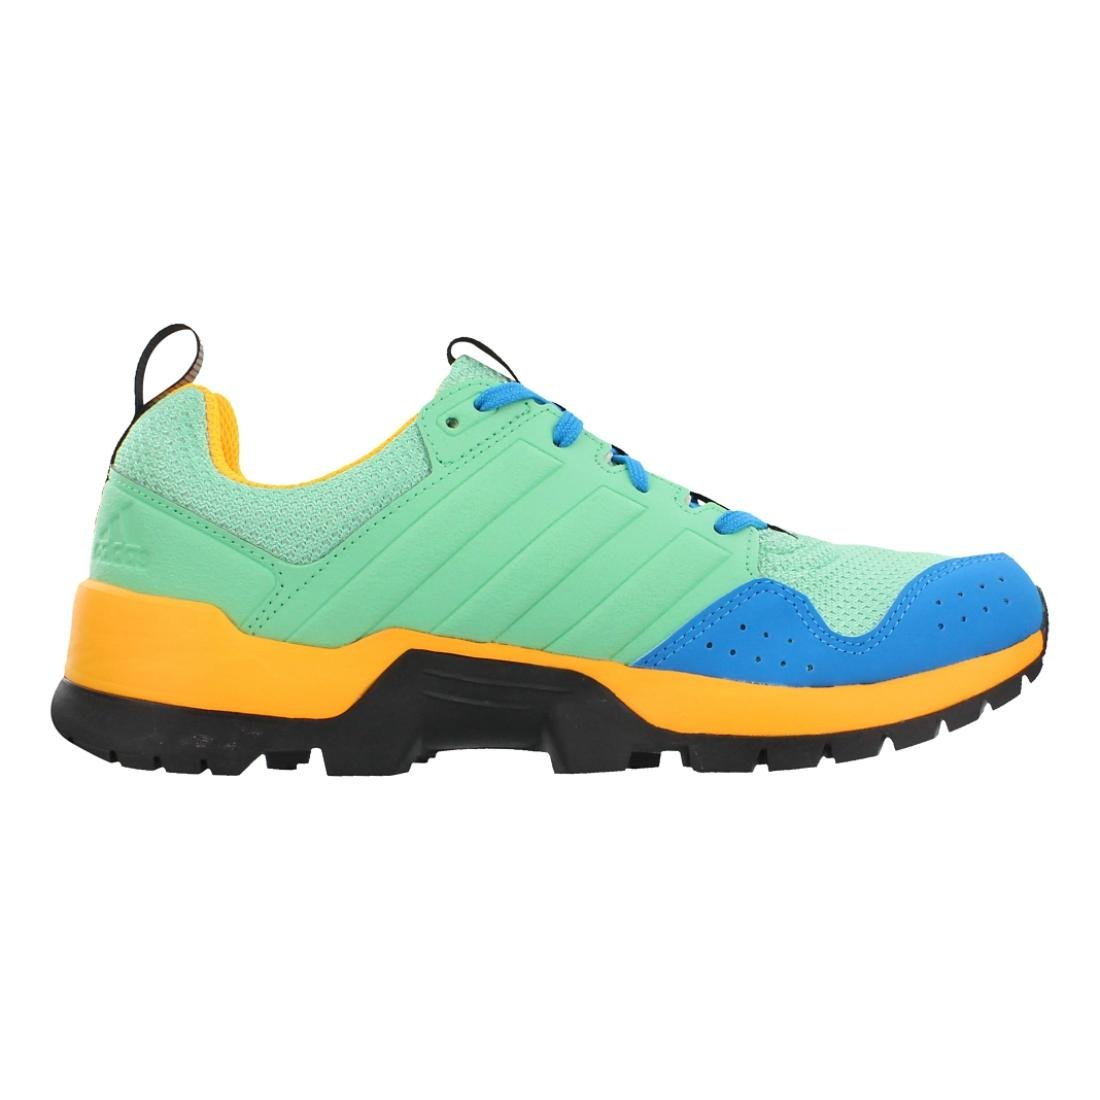 adidas outdoor Women's Gsg9 6 Trail Running Shoe B0116E7PCE 6 Gsg9 B(M) US|Green Glow/Black/Solar Gold 32e247